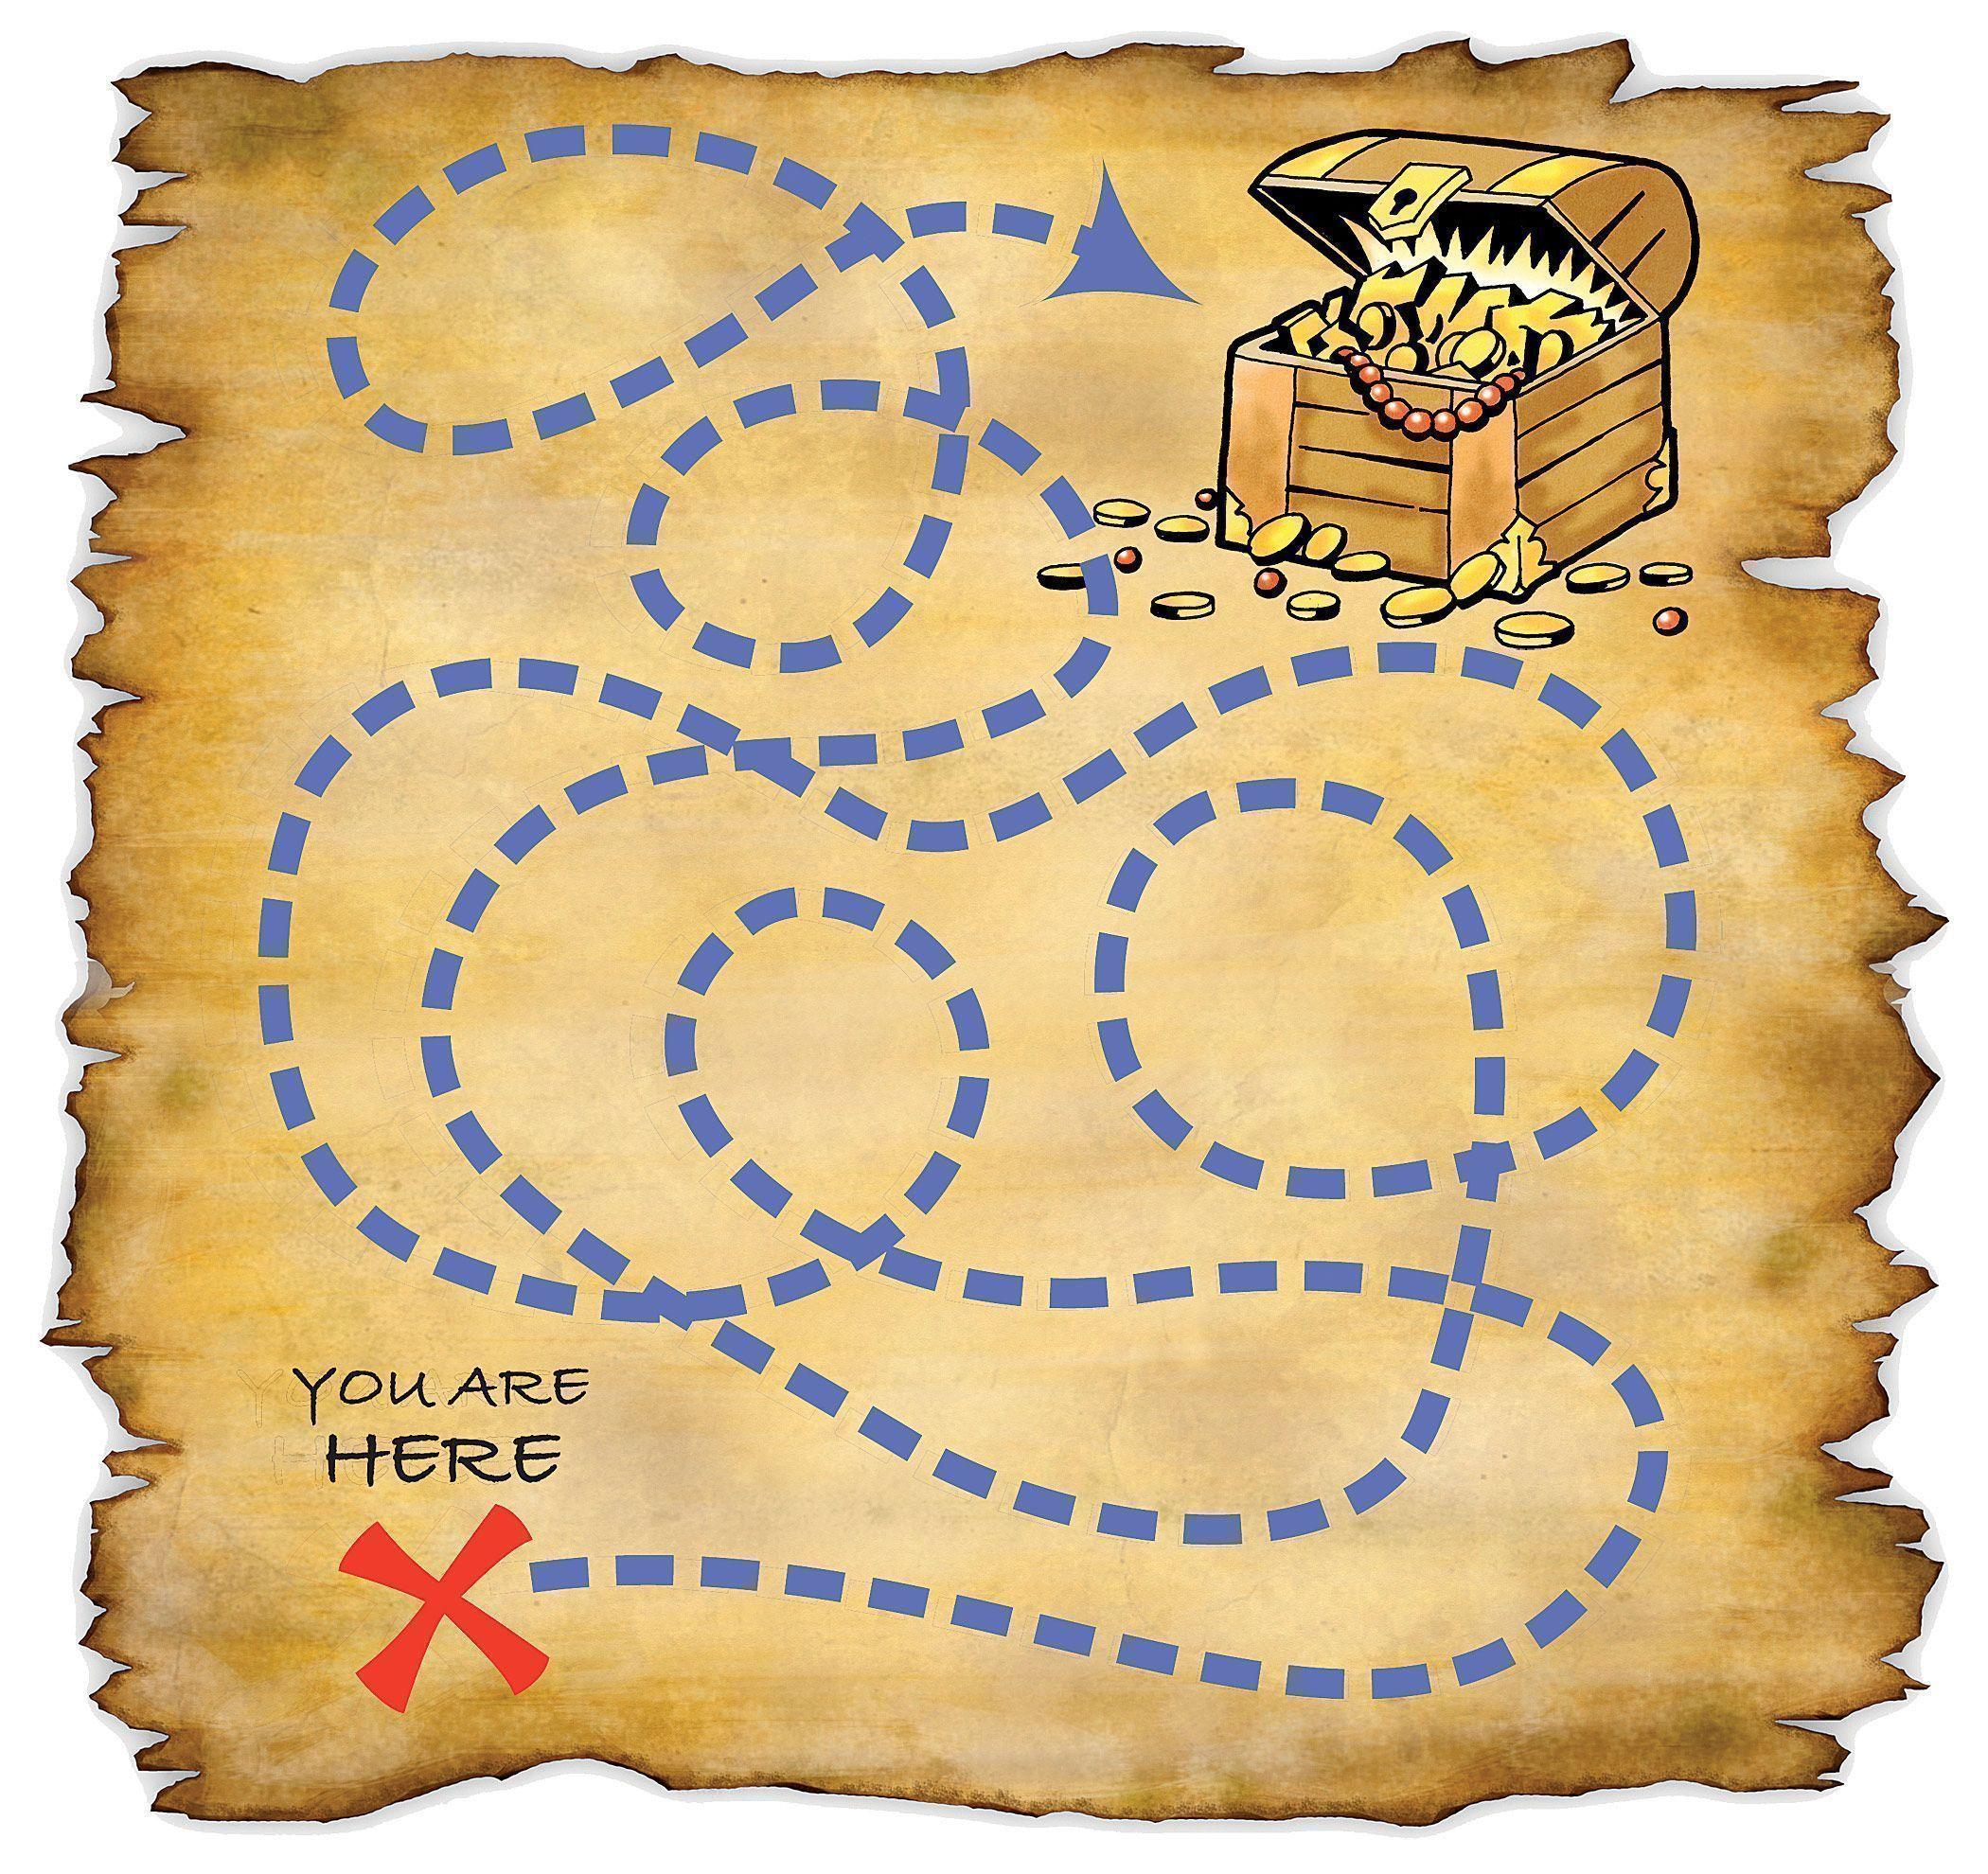 Scroll paper template word romeondinez scroll paper template word maxwellsz